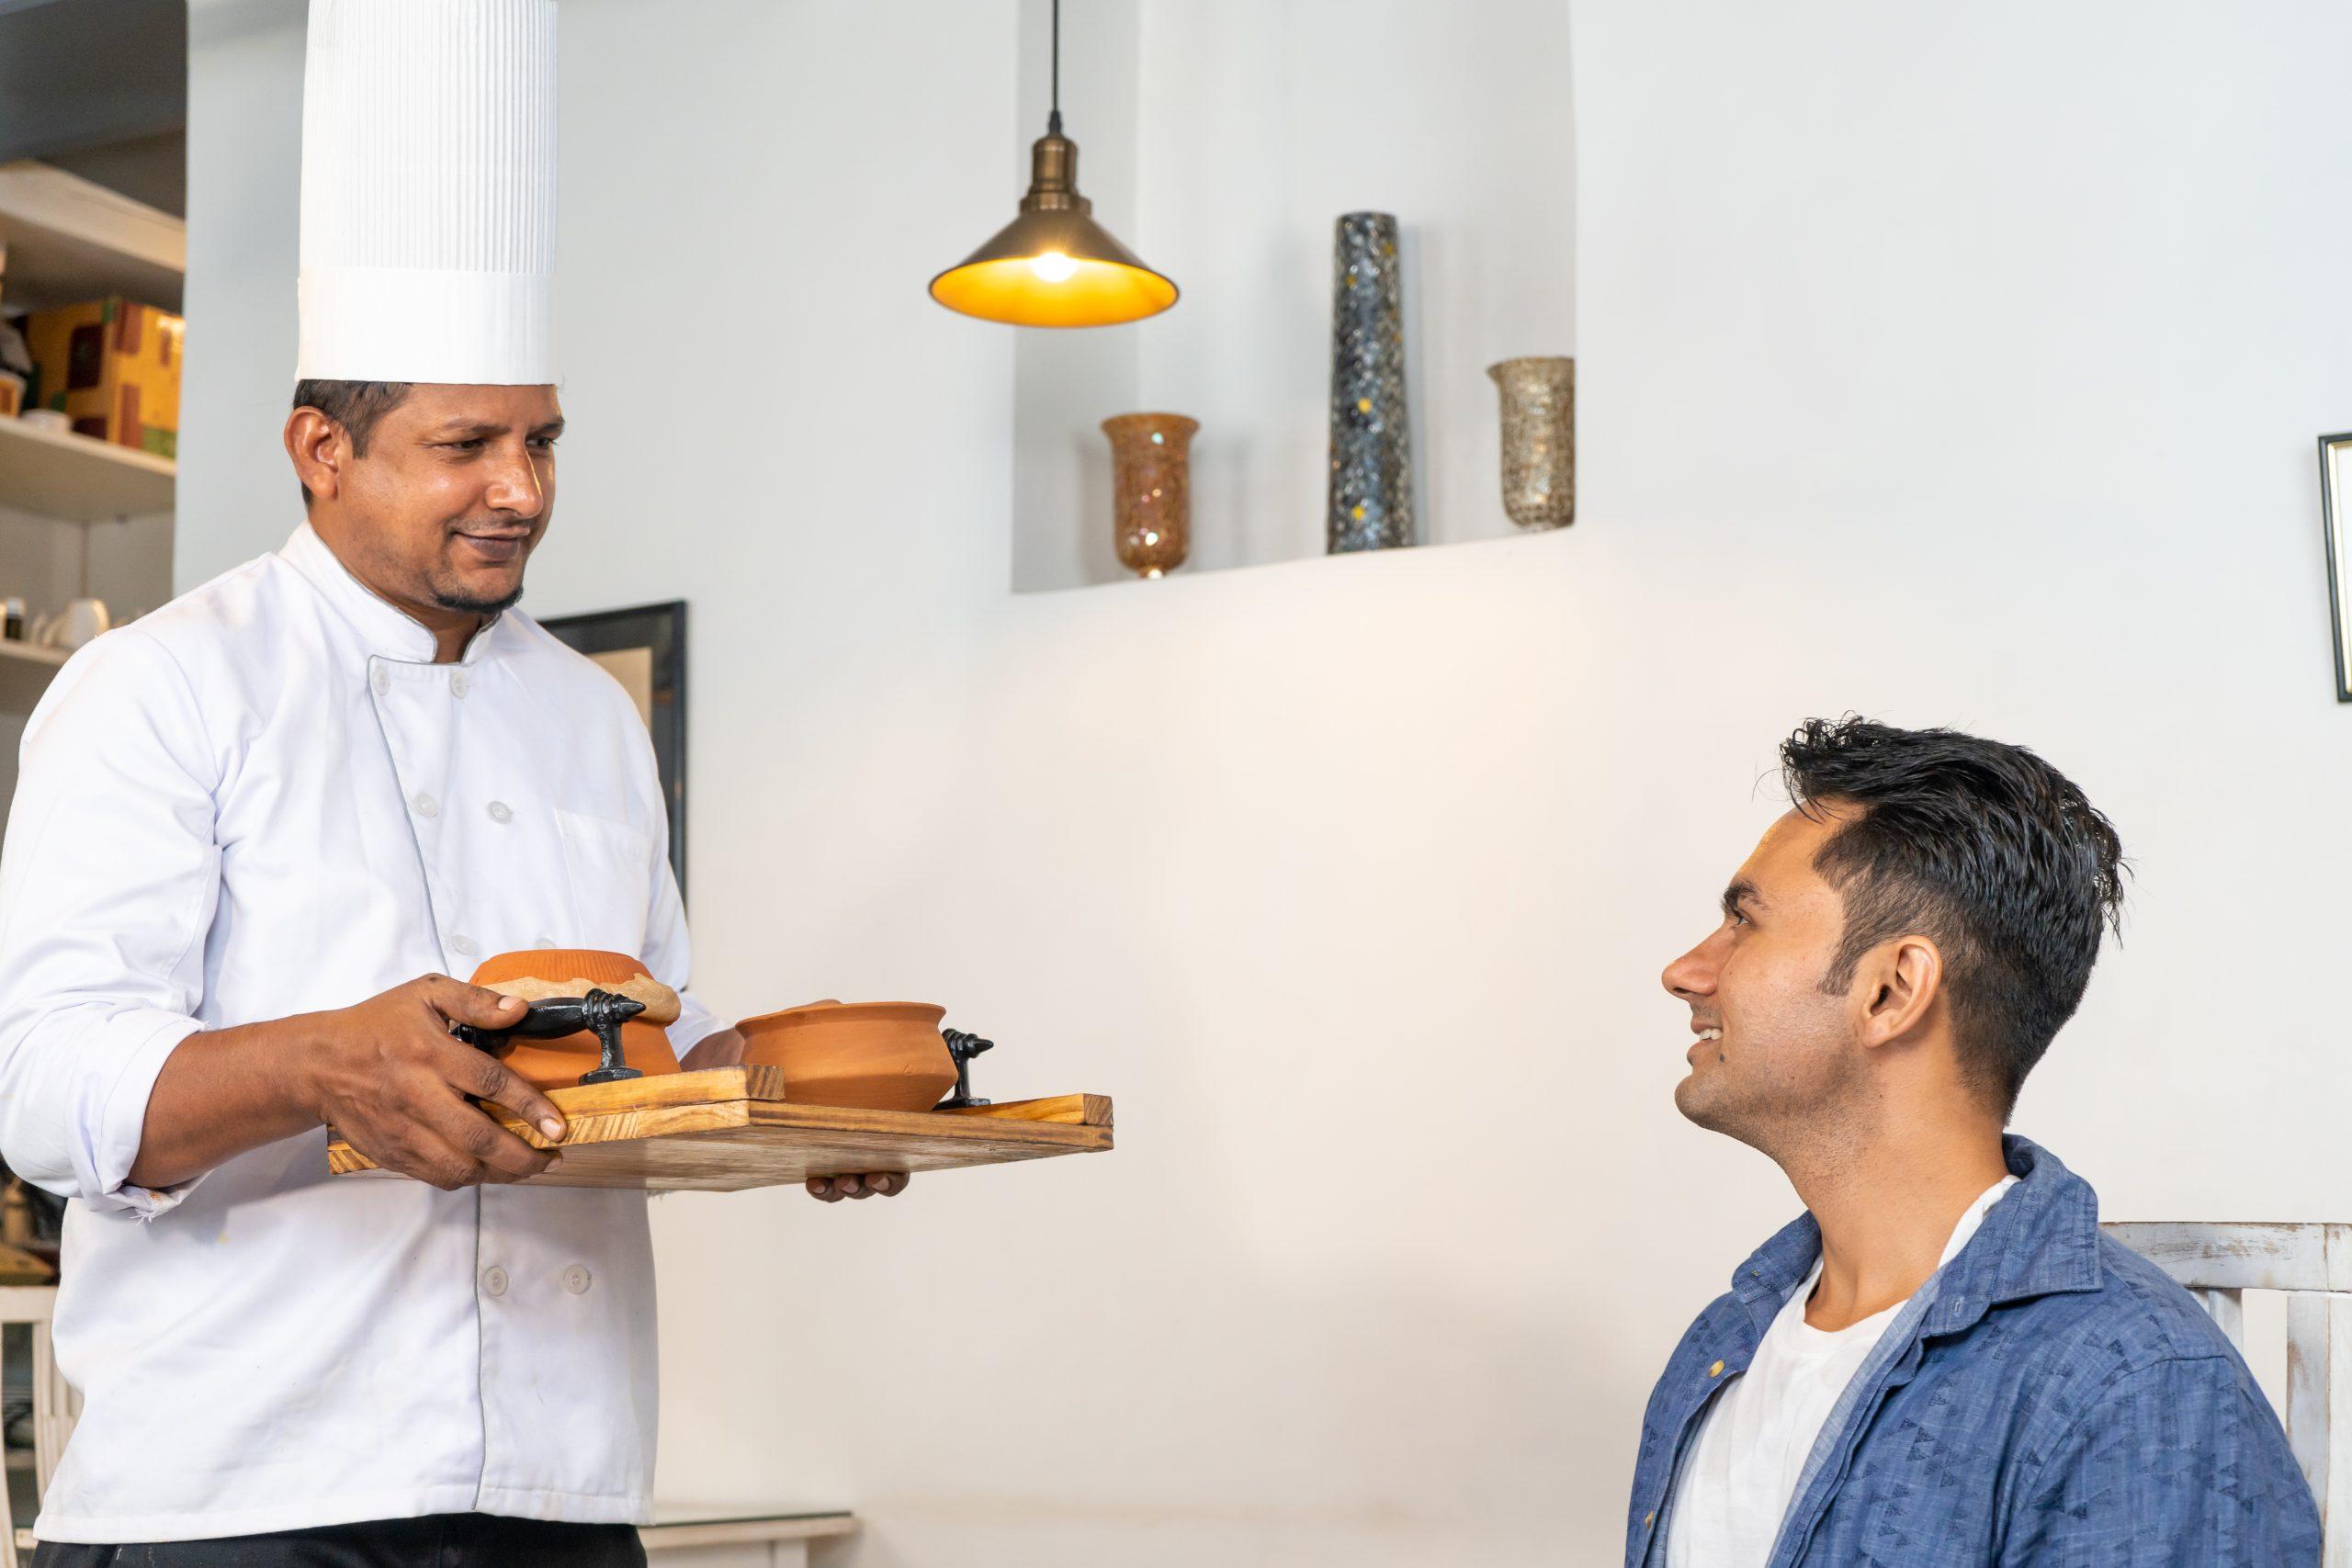 Chef bringing food